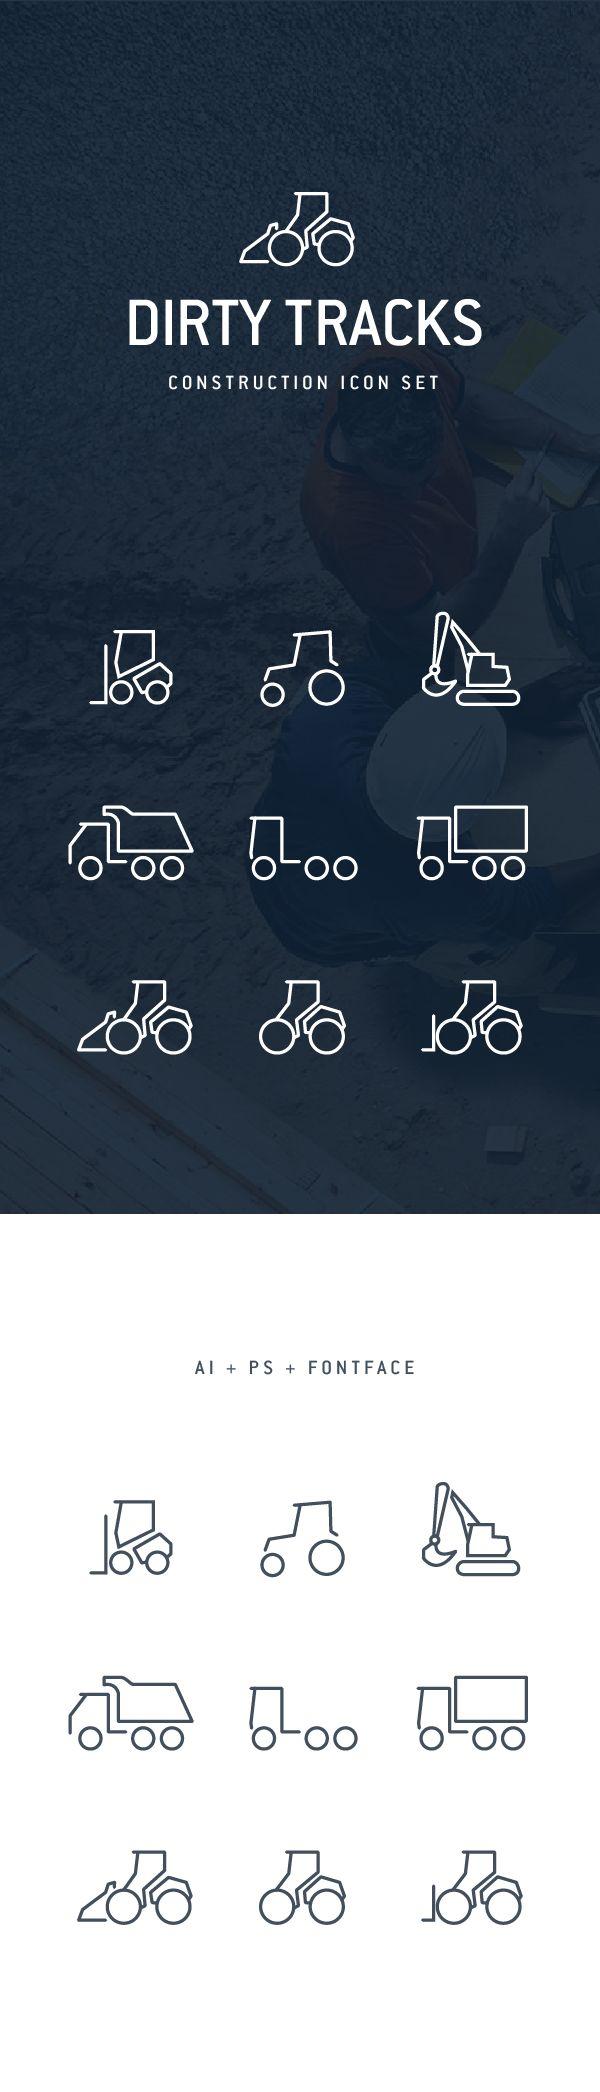 Dirty Tracks Free Flat Icon Set on Behance